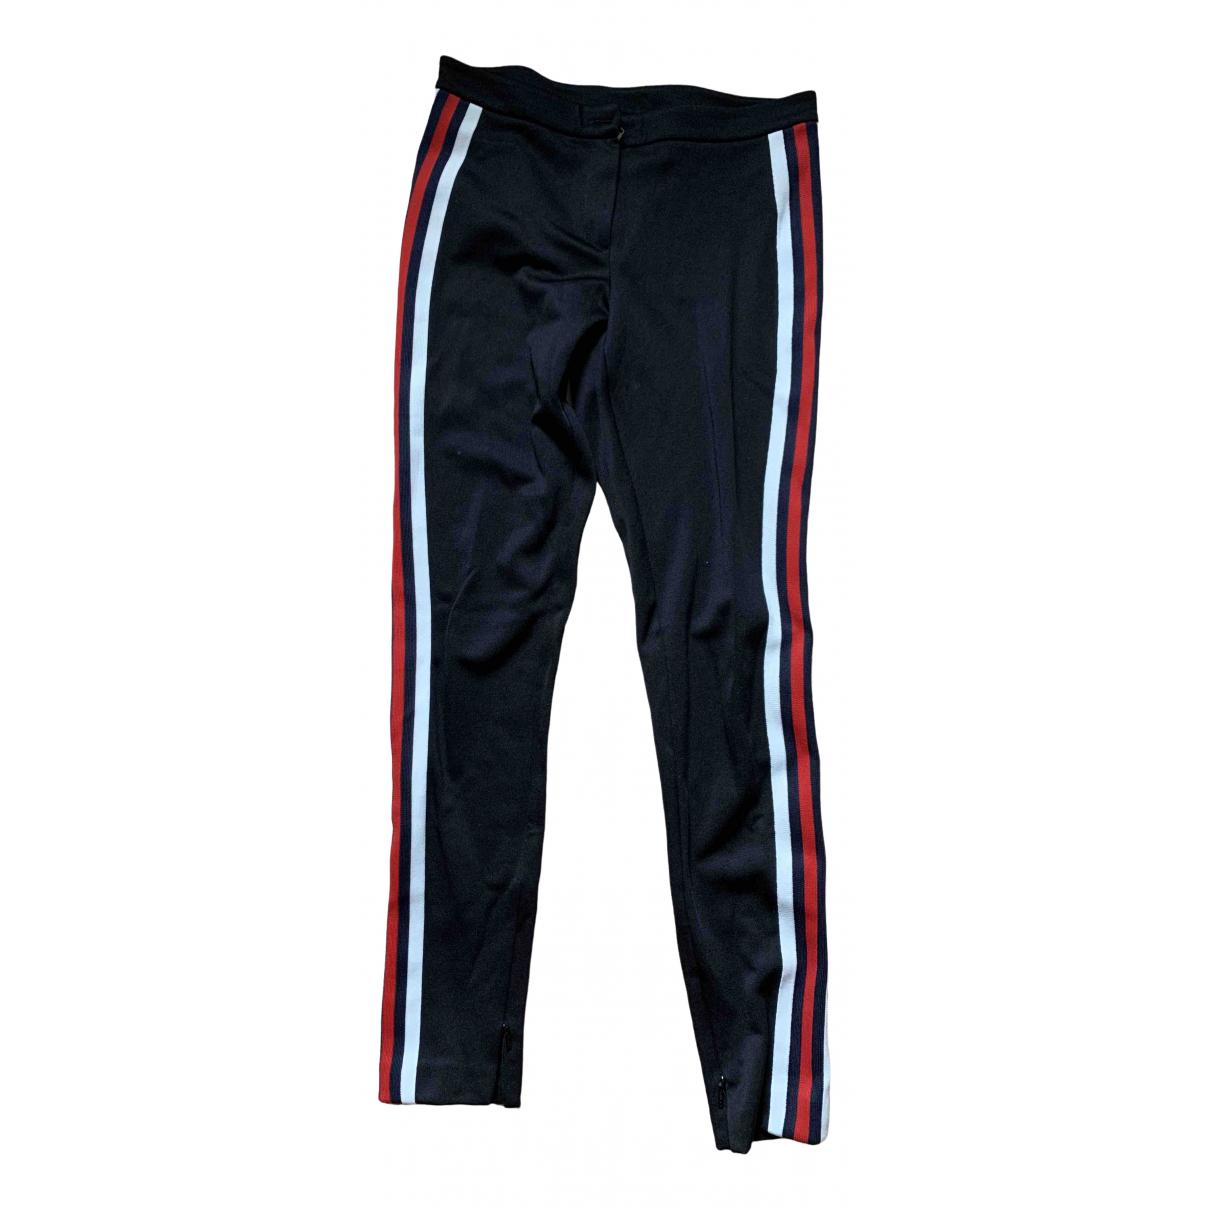 Gucci \N Black Trousers for Women XS International